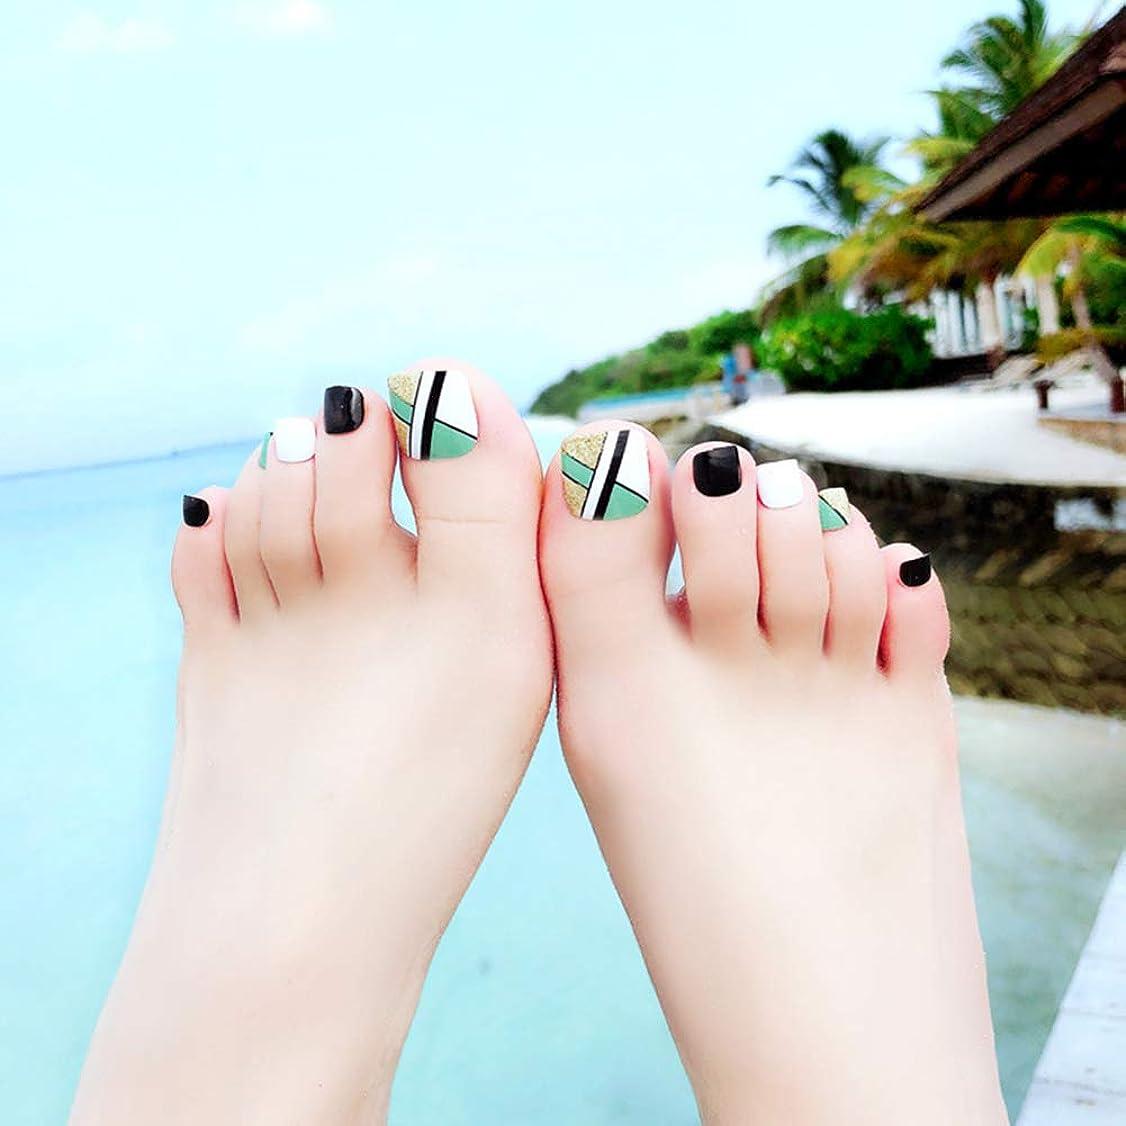 HuangHM 森ガール 可愛い スイート足用 フットネイルチップ 全3色 親指足ネイルシールつけ爪 付け爪 手作りフットチップ ペディキュアチップ 足の爪用ネイルチップ トゥーチップ